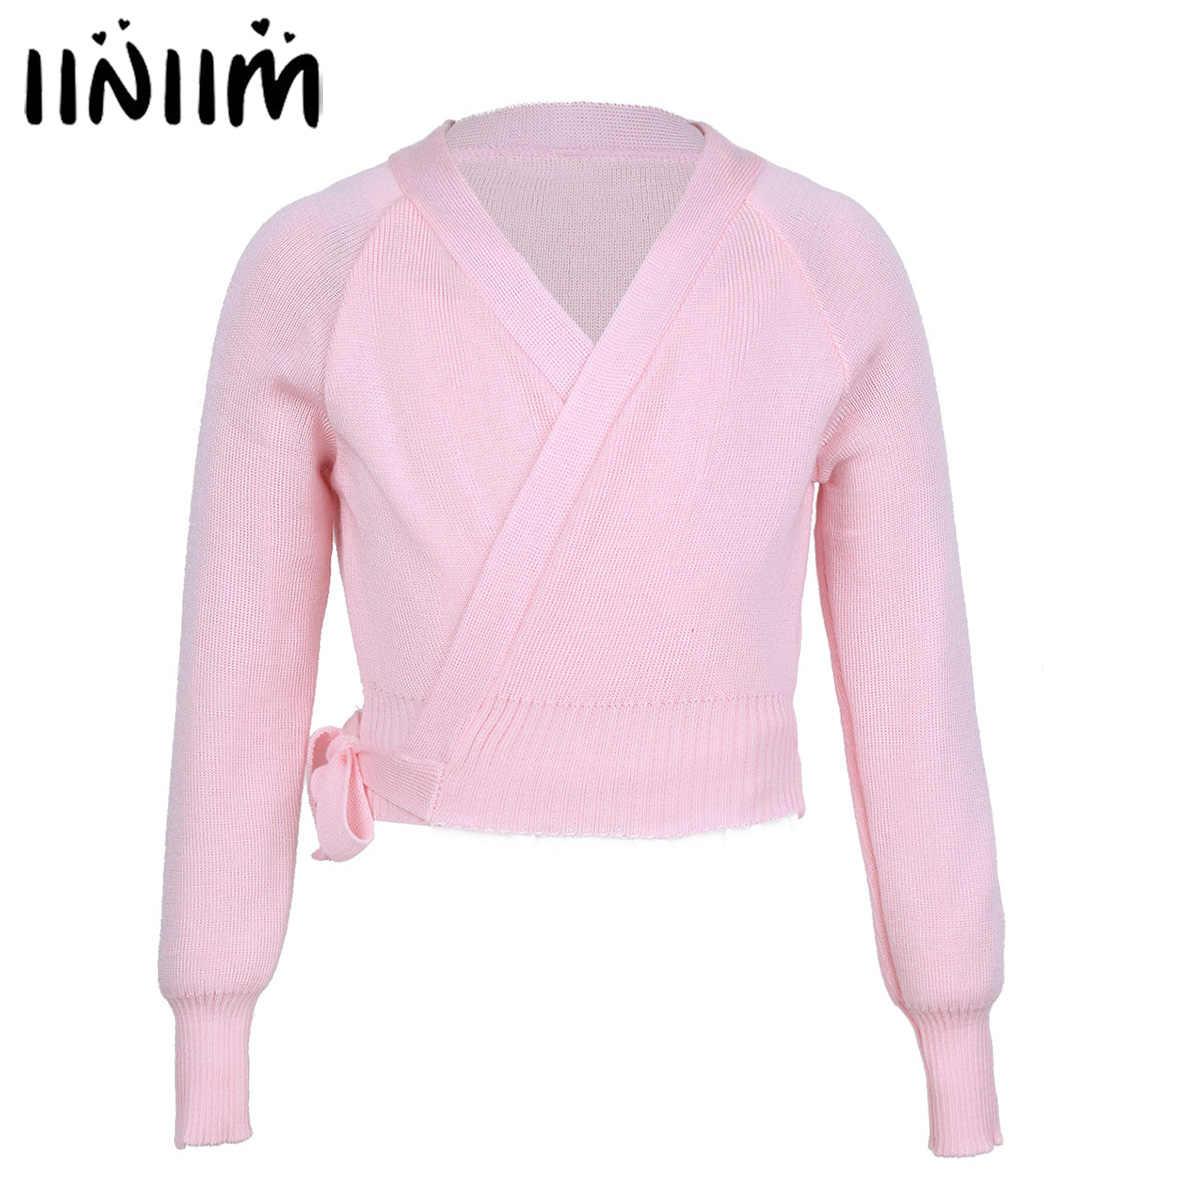 0f6a88296 Kids Girls Spring Tutu Ballet Clothing Knit Wrap Sweater Ballerina Ballet  Dance Cardigan Warm-up